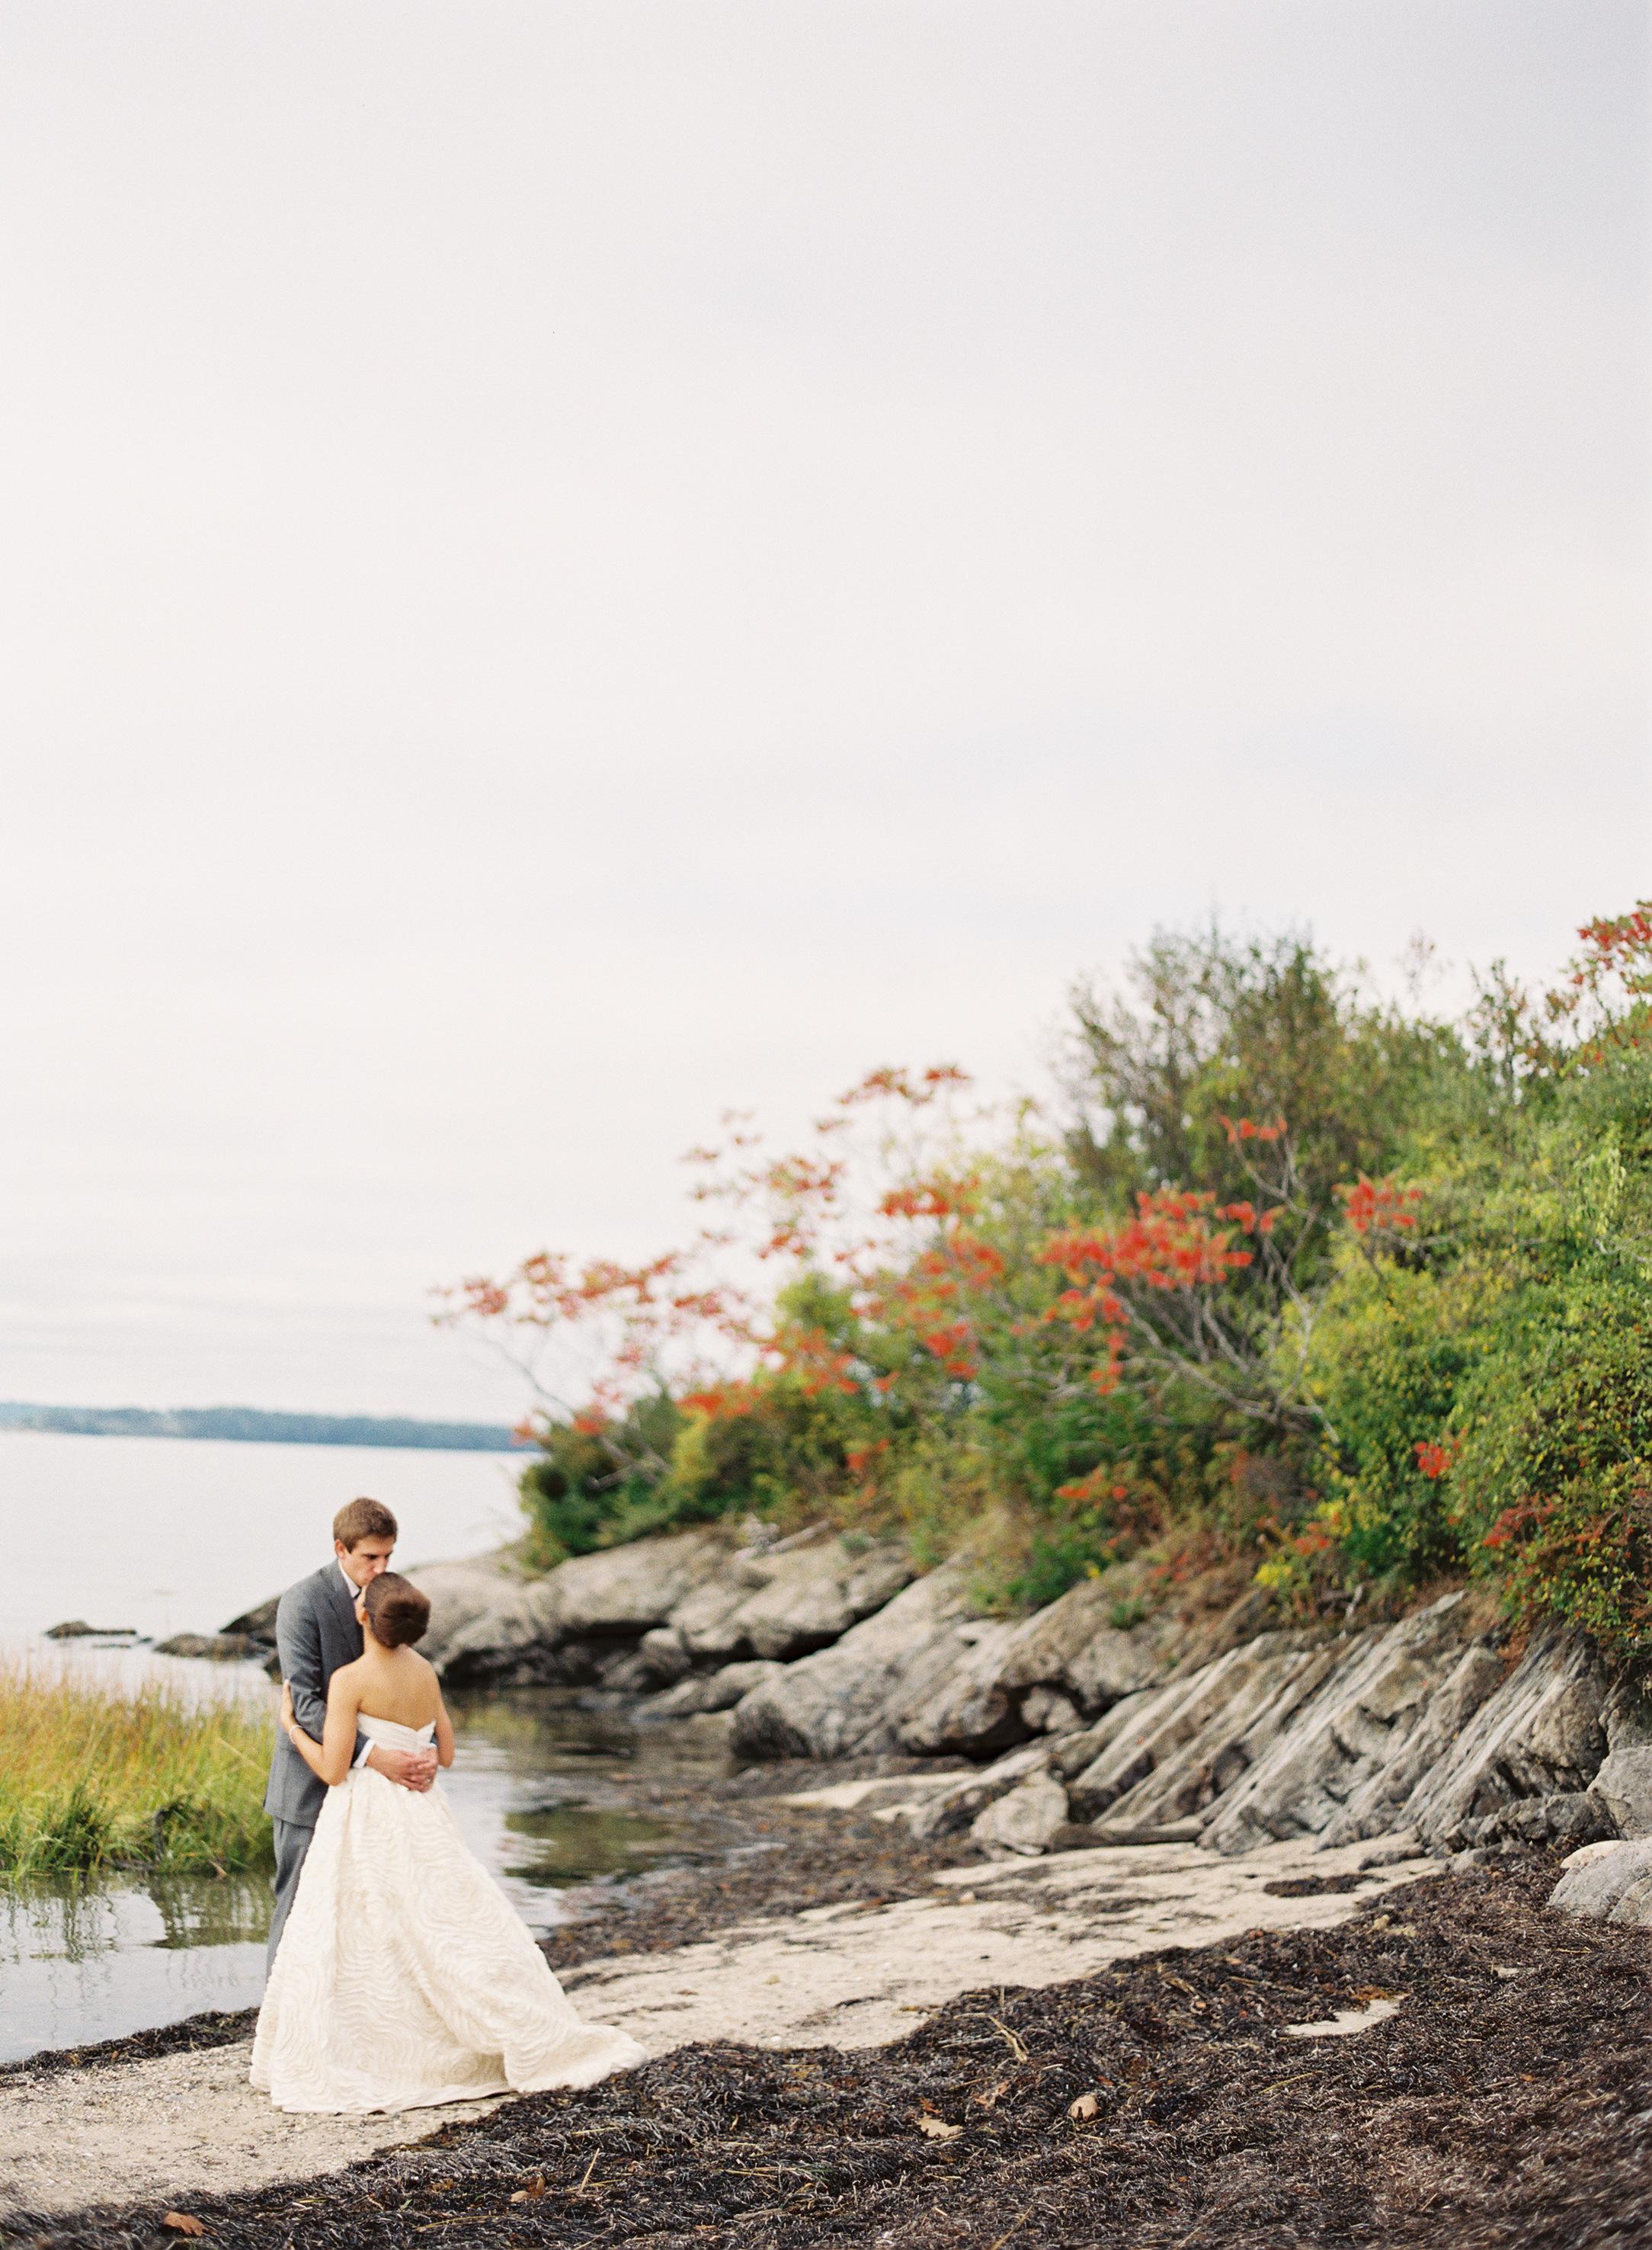 chebeague_island_inn_wedding_gabe_aceves023.JPG